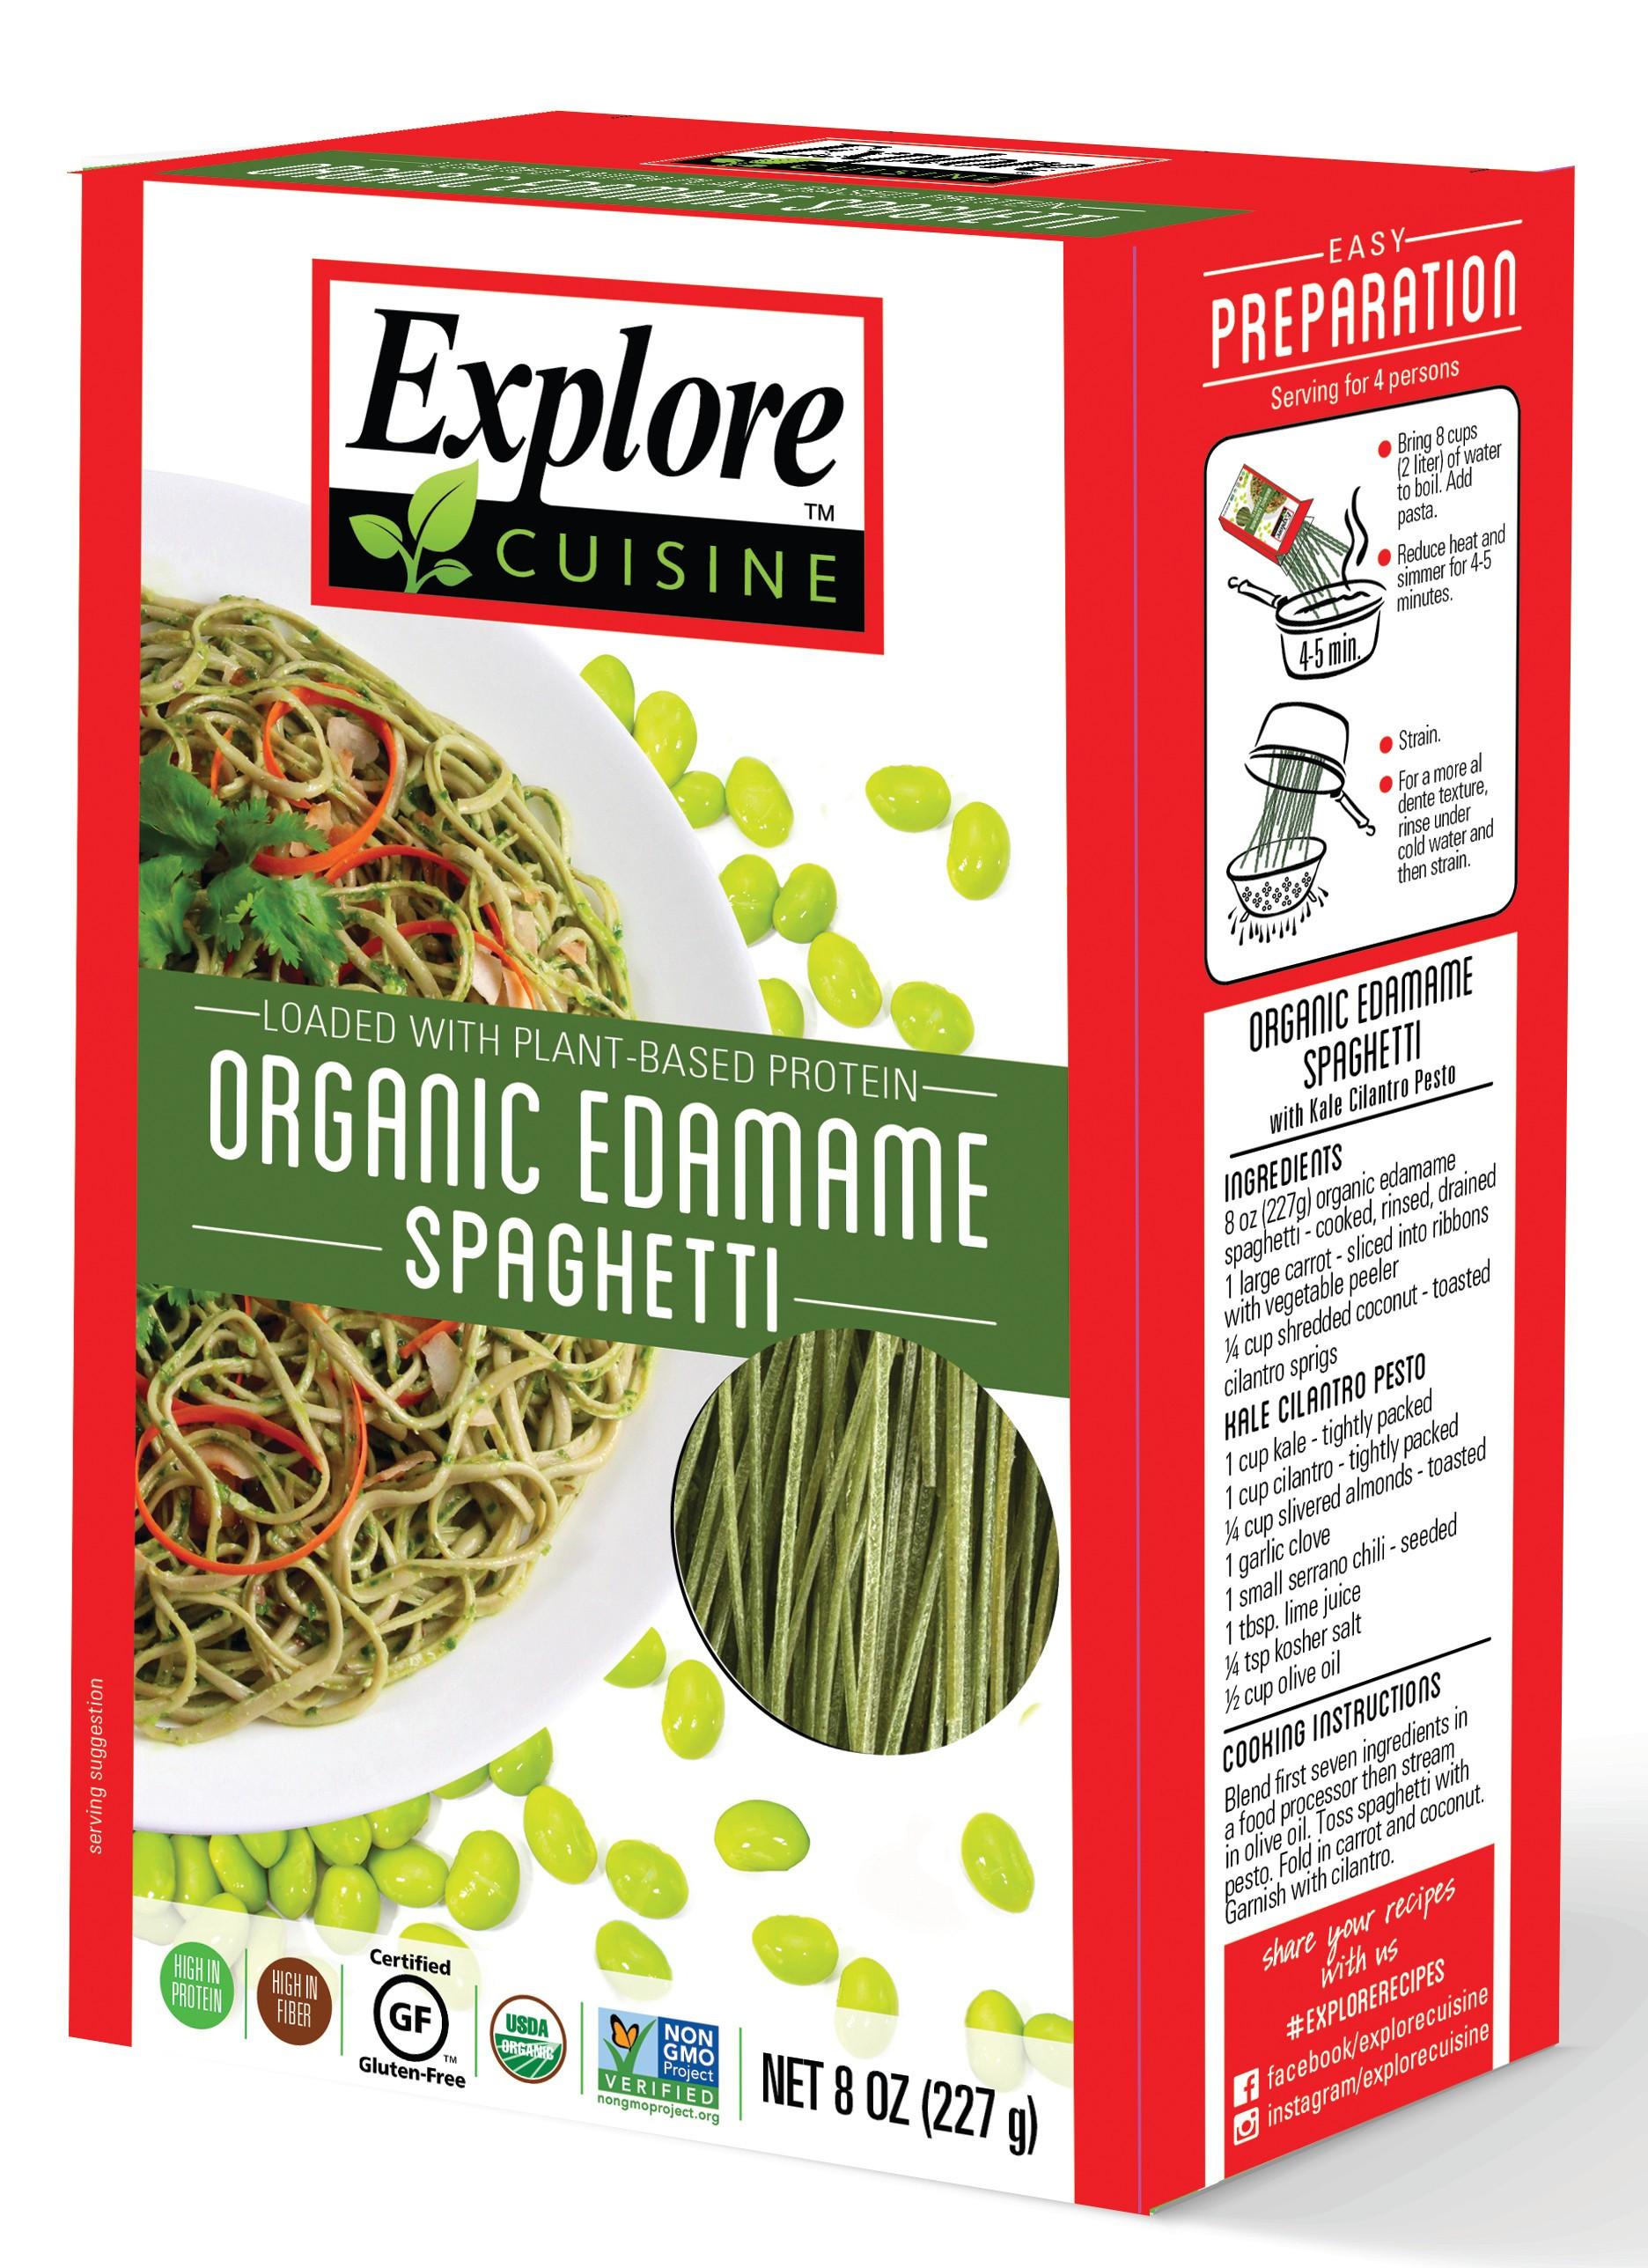 Explore Cuisine Organic Edamame Spaghetti  ORGANIC Edamame spaghetti BEAN PASTAS PRODUCTS